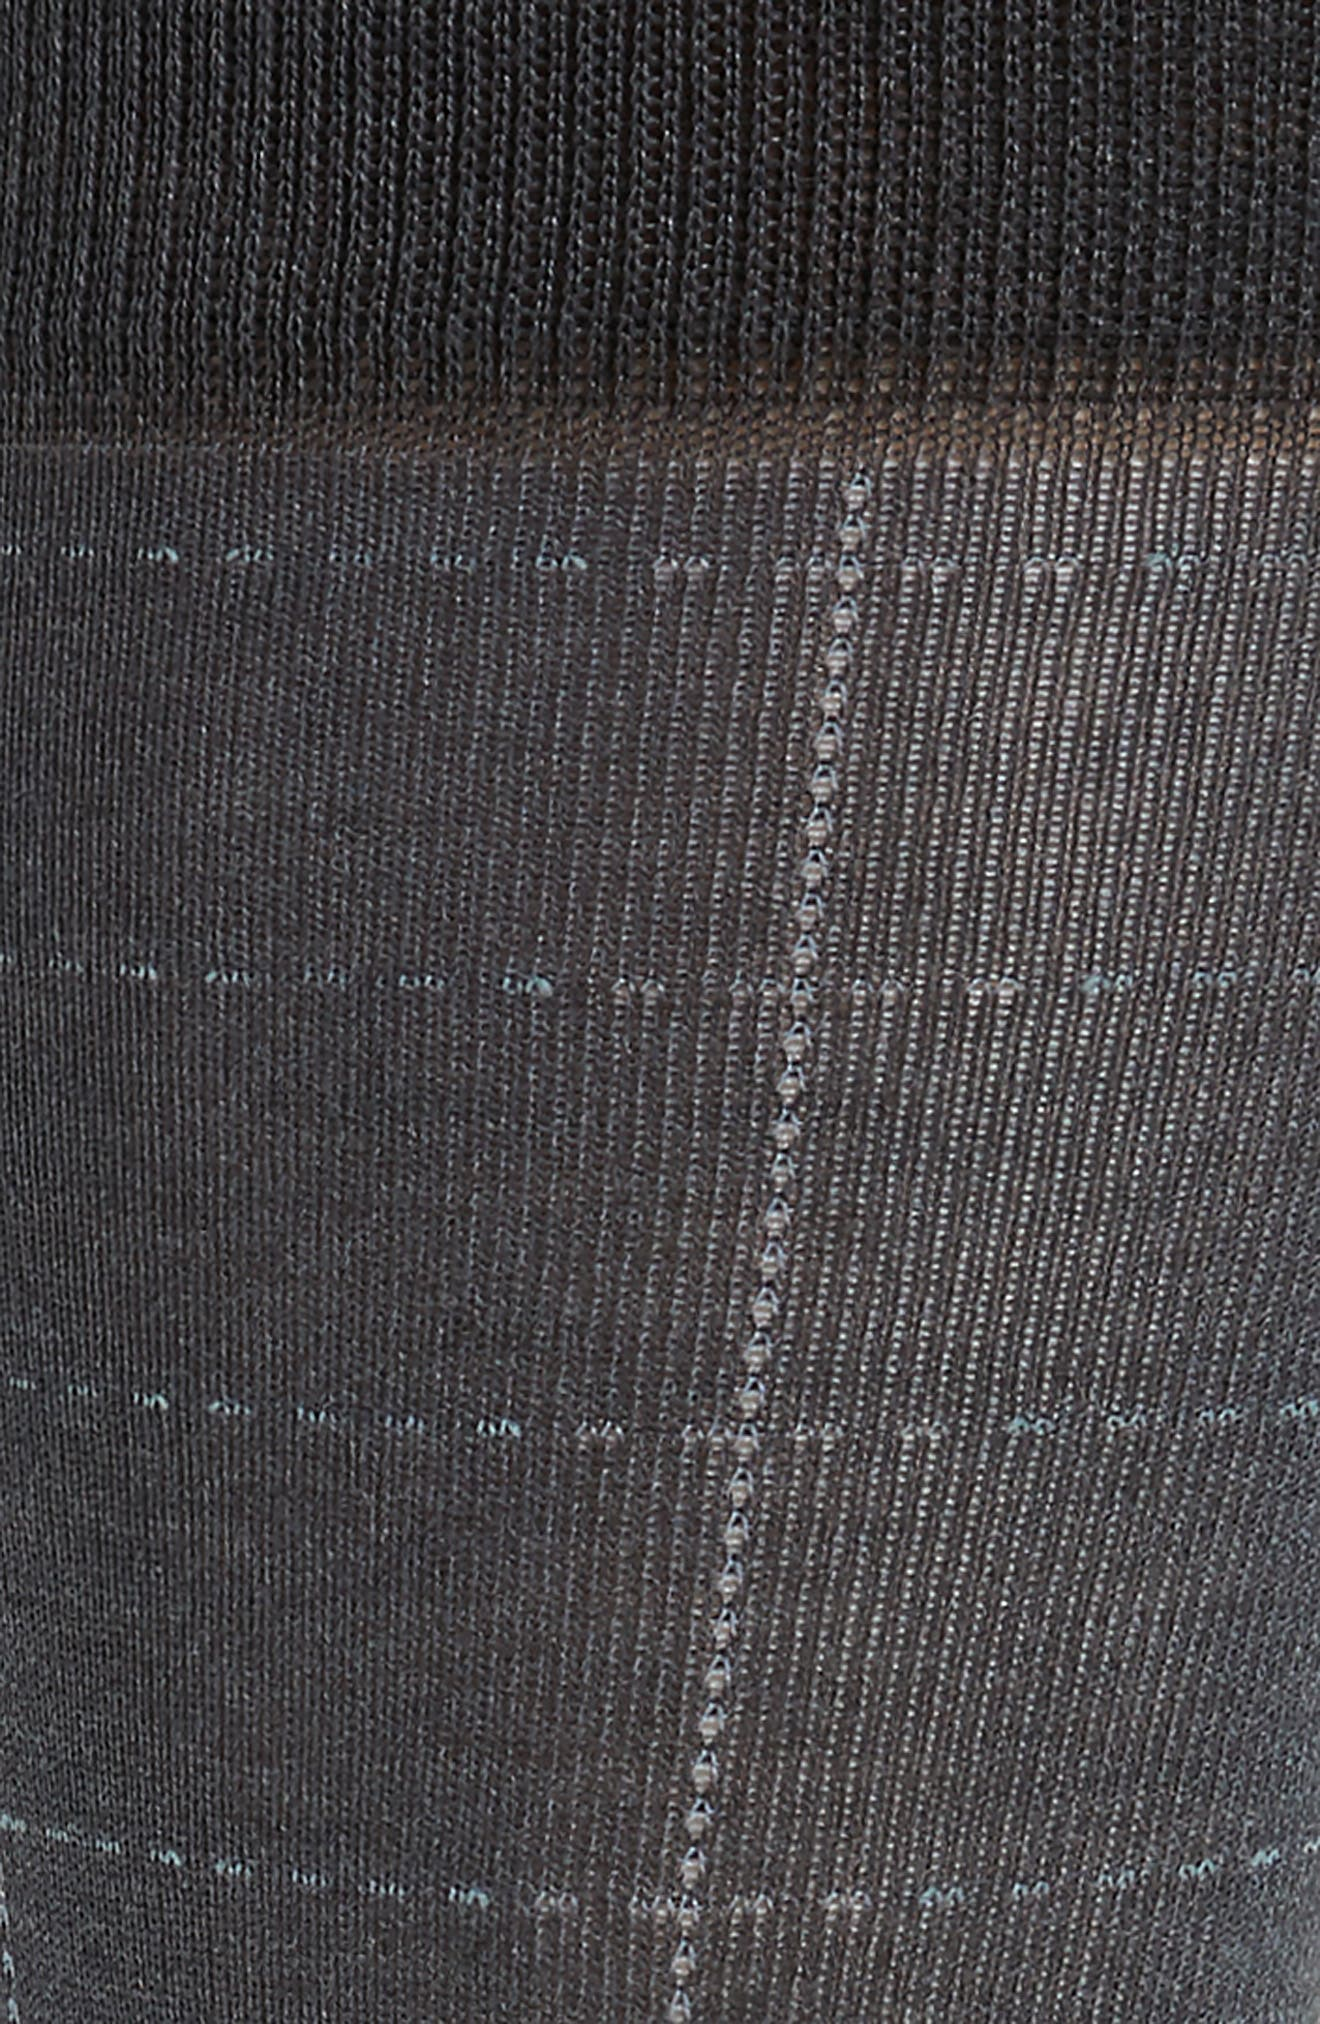 Broken Grid Socks,                             Alternate thumbnail 2, color,                             Charcoal Heather